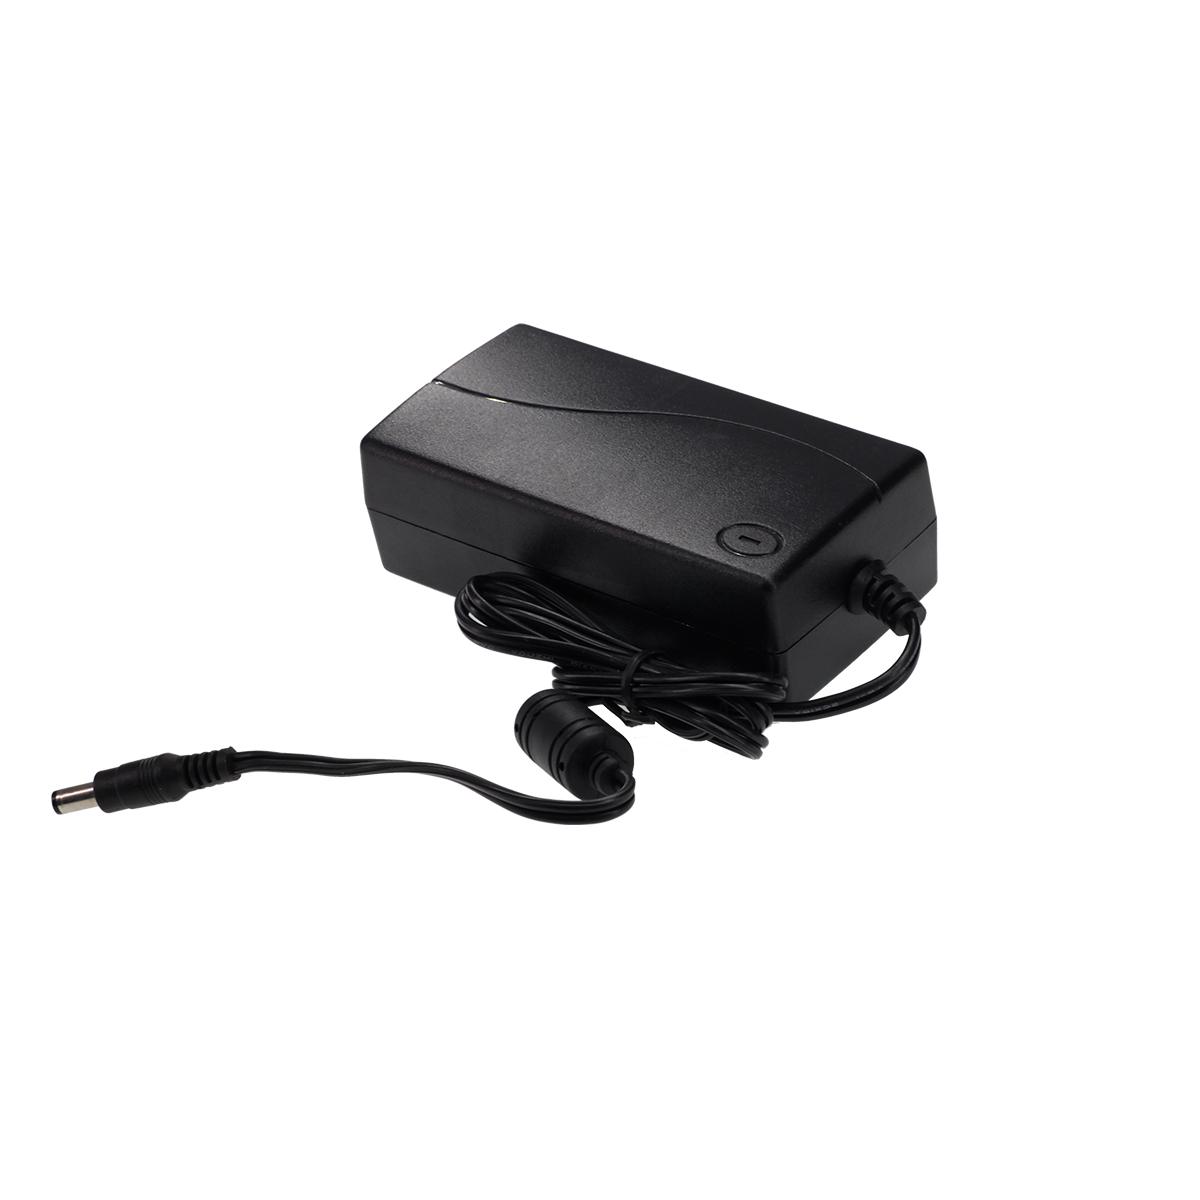 12V Power Adapter (suitable for mult-regions)